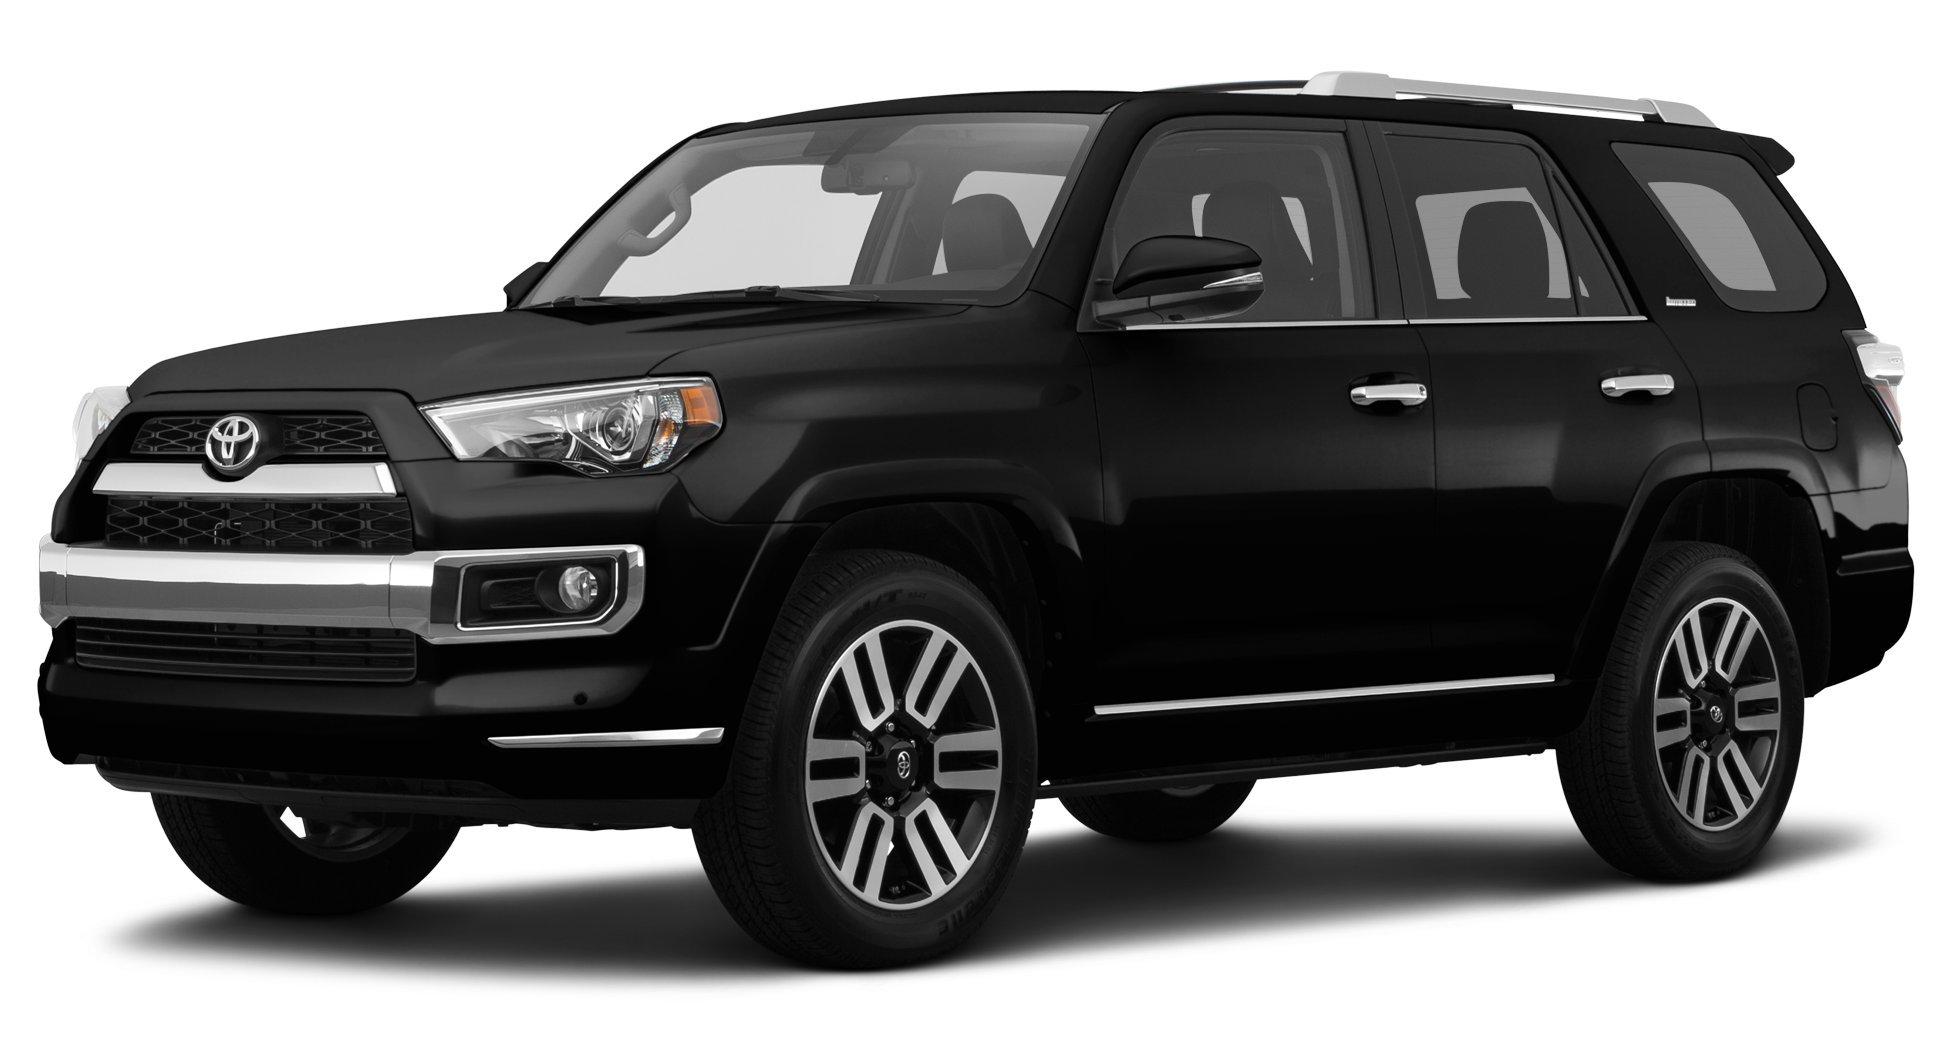 Toyota Tacoma 2015-2018 Service Manual: On-vehicle Inspection